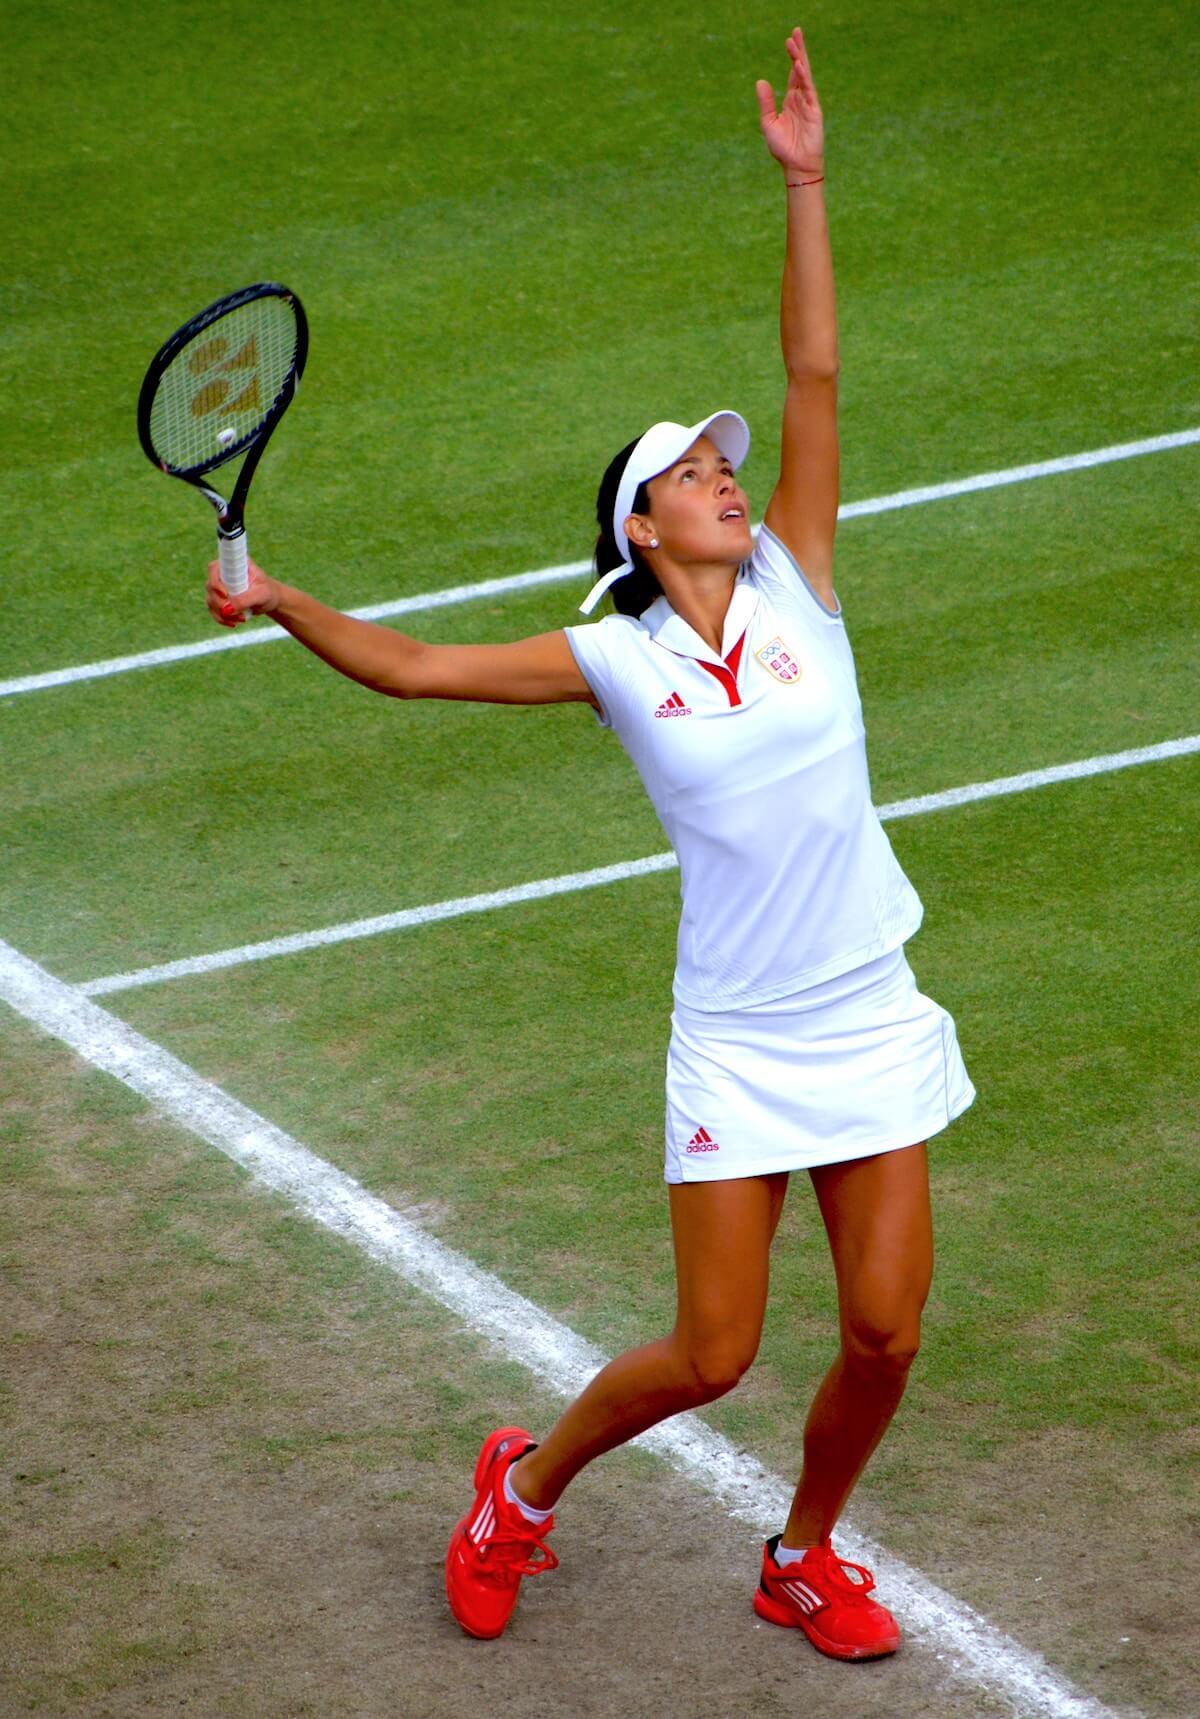 unsplash-zoe-reeve-woman-serving-tennis-ball